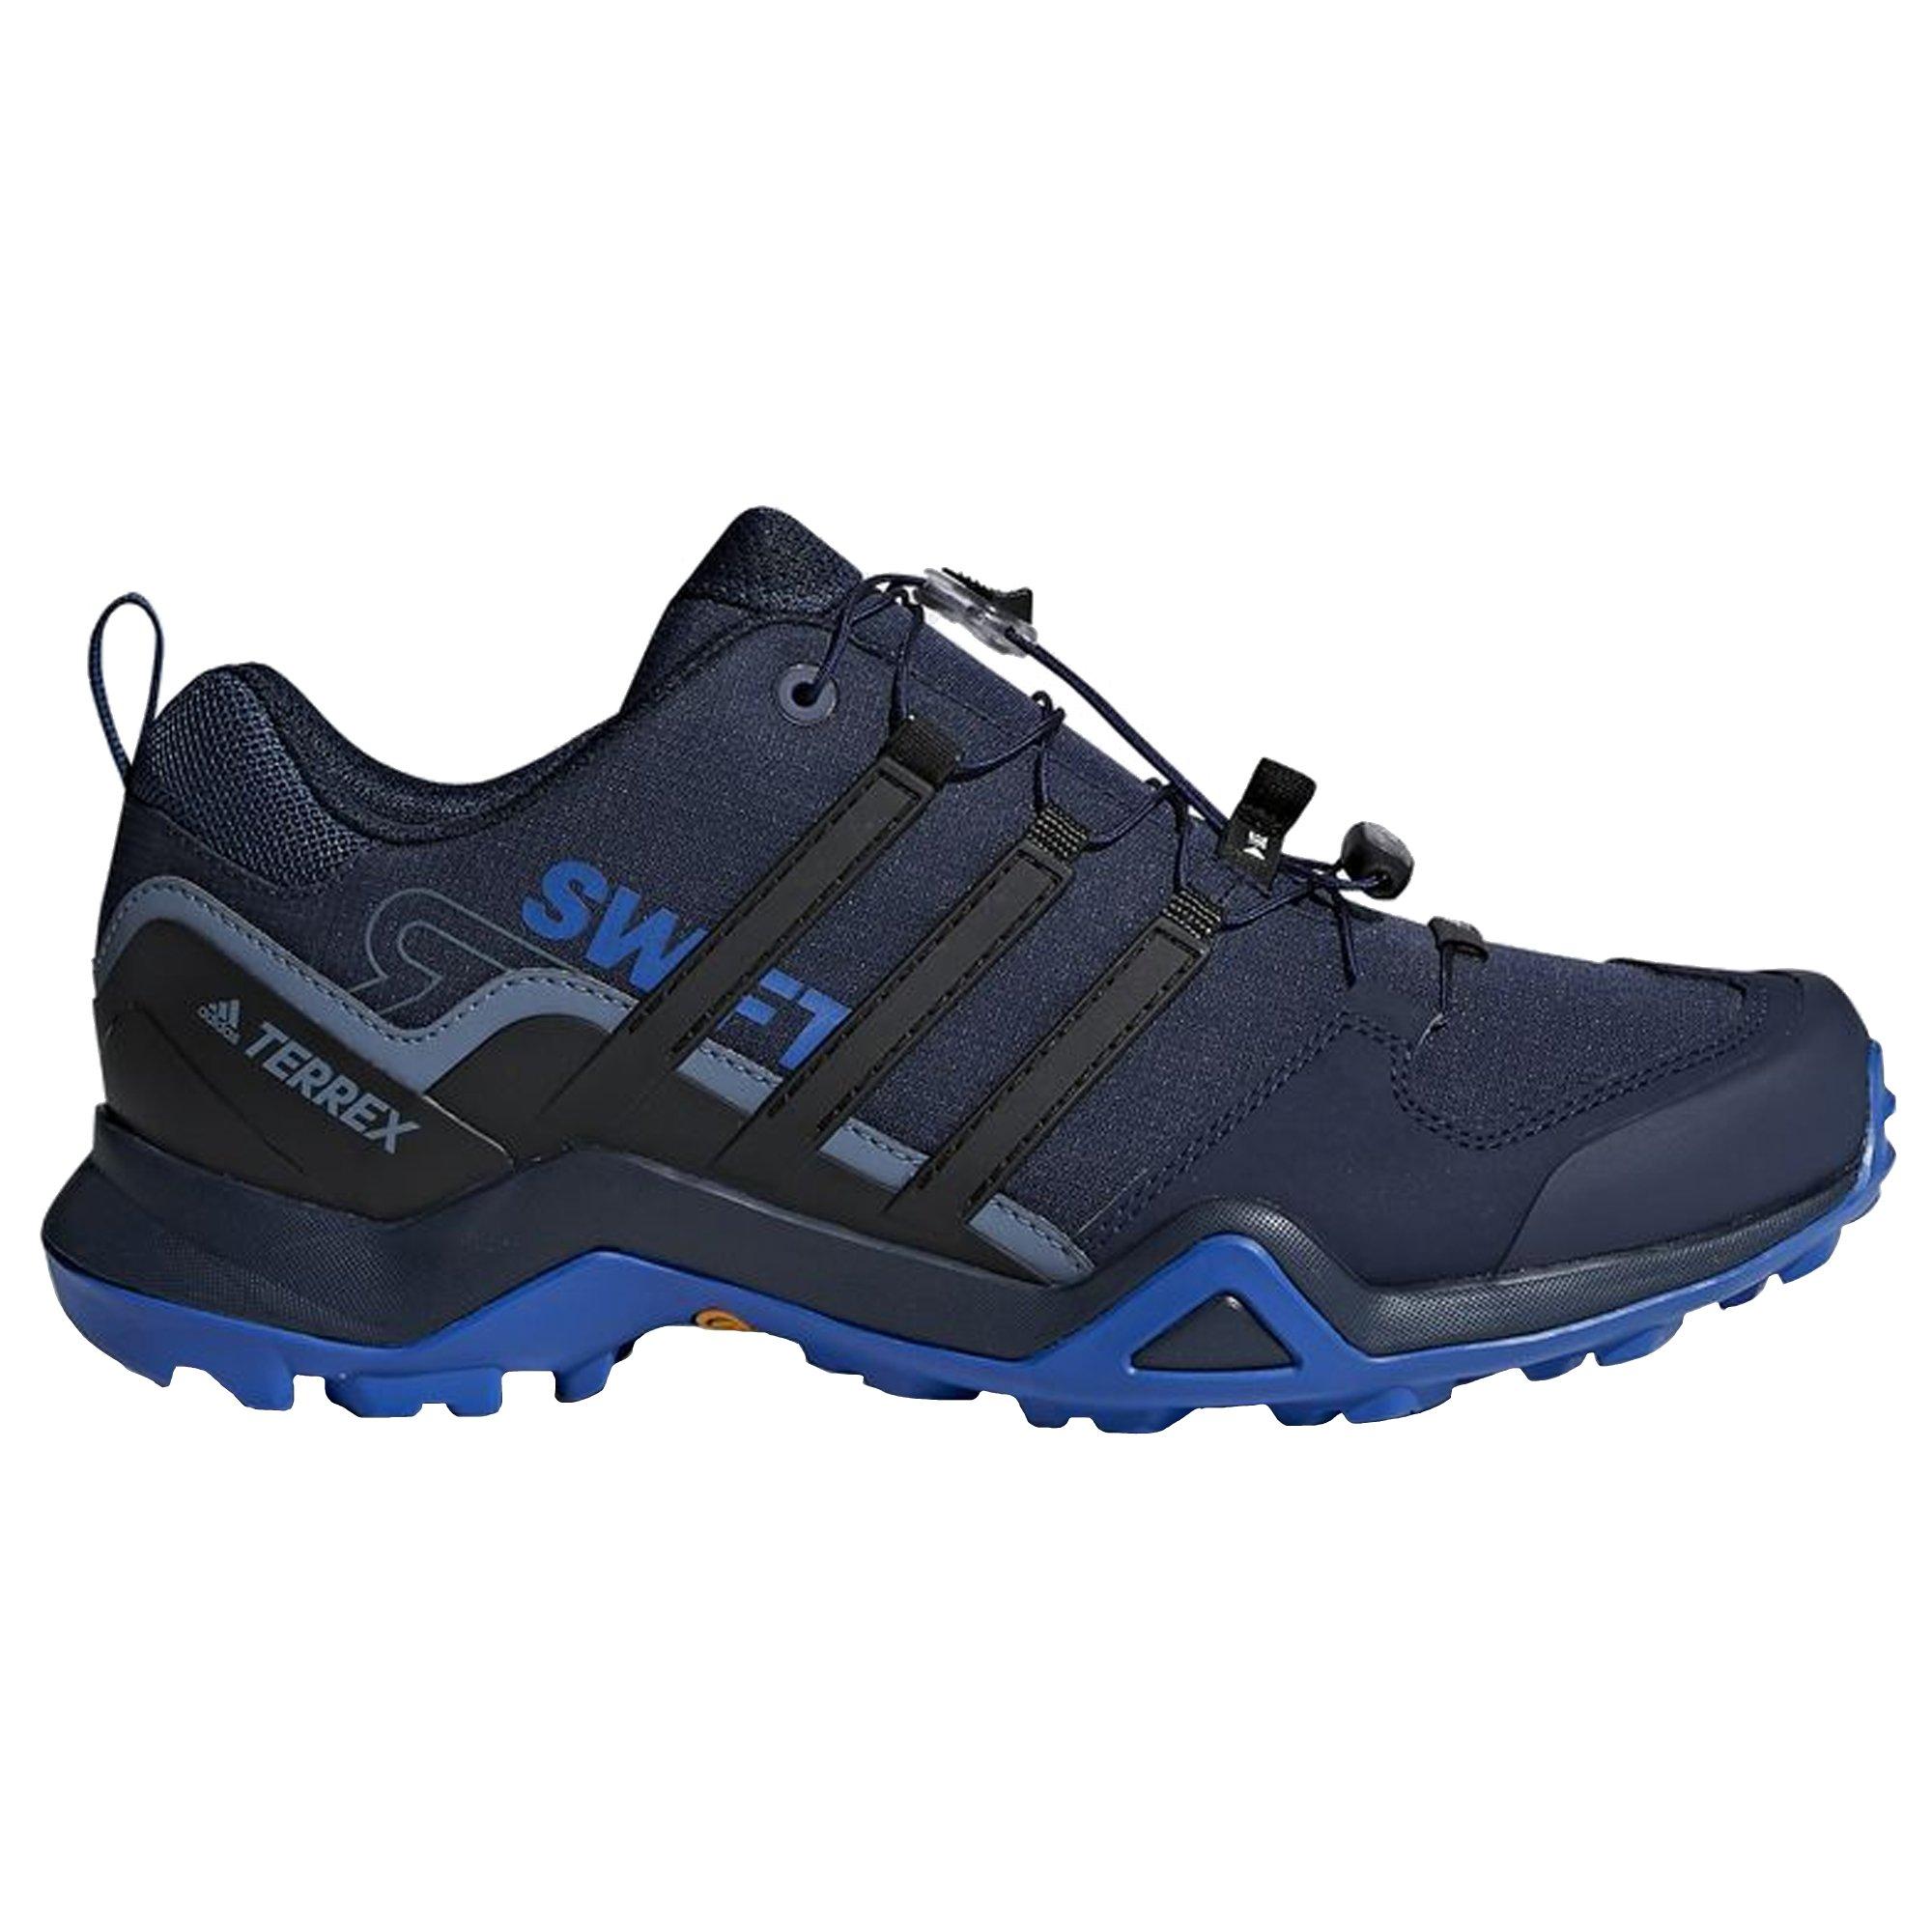 adidas New Men's Terrex Swift R2 Hiking Shoe Blue/Black 12